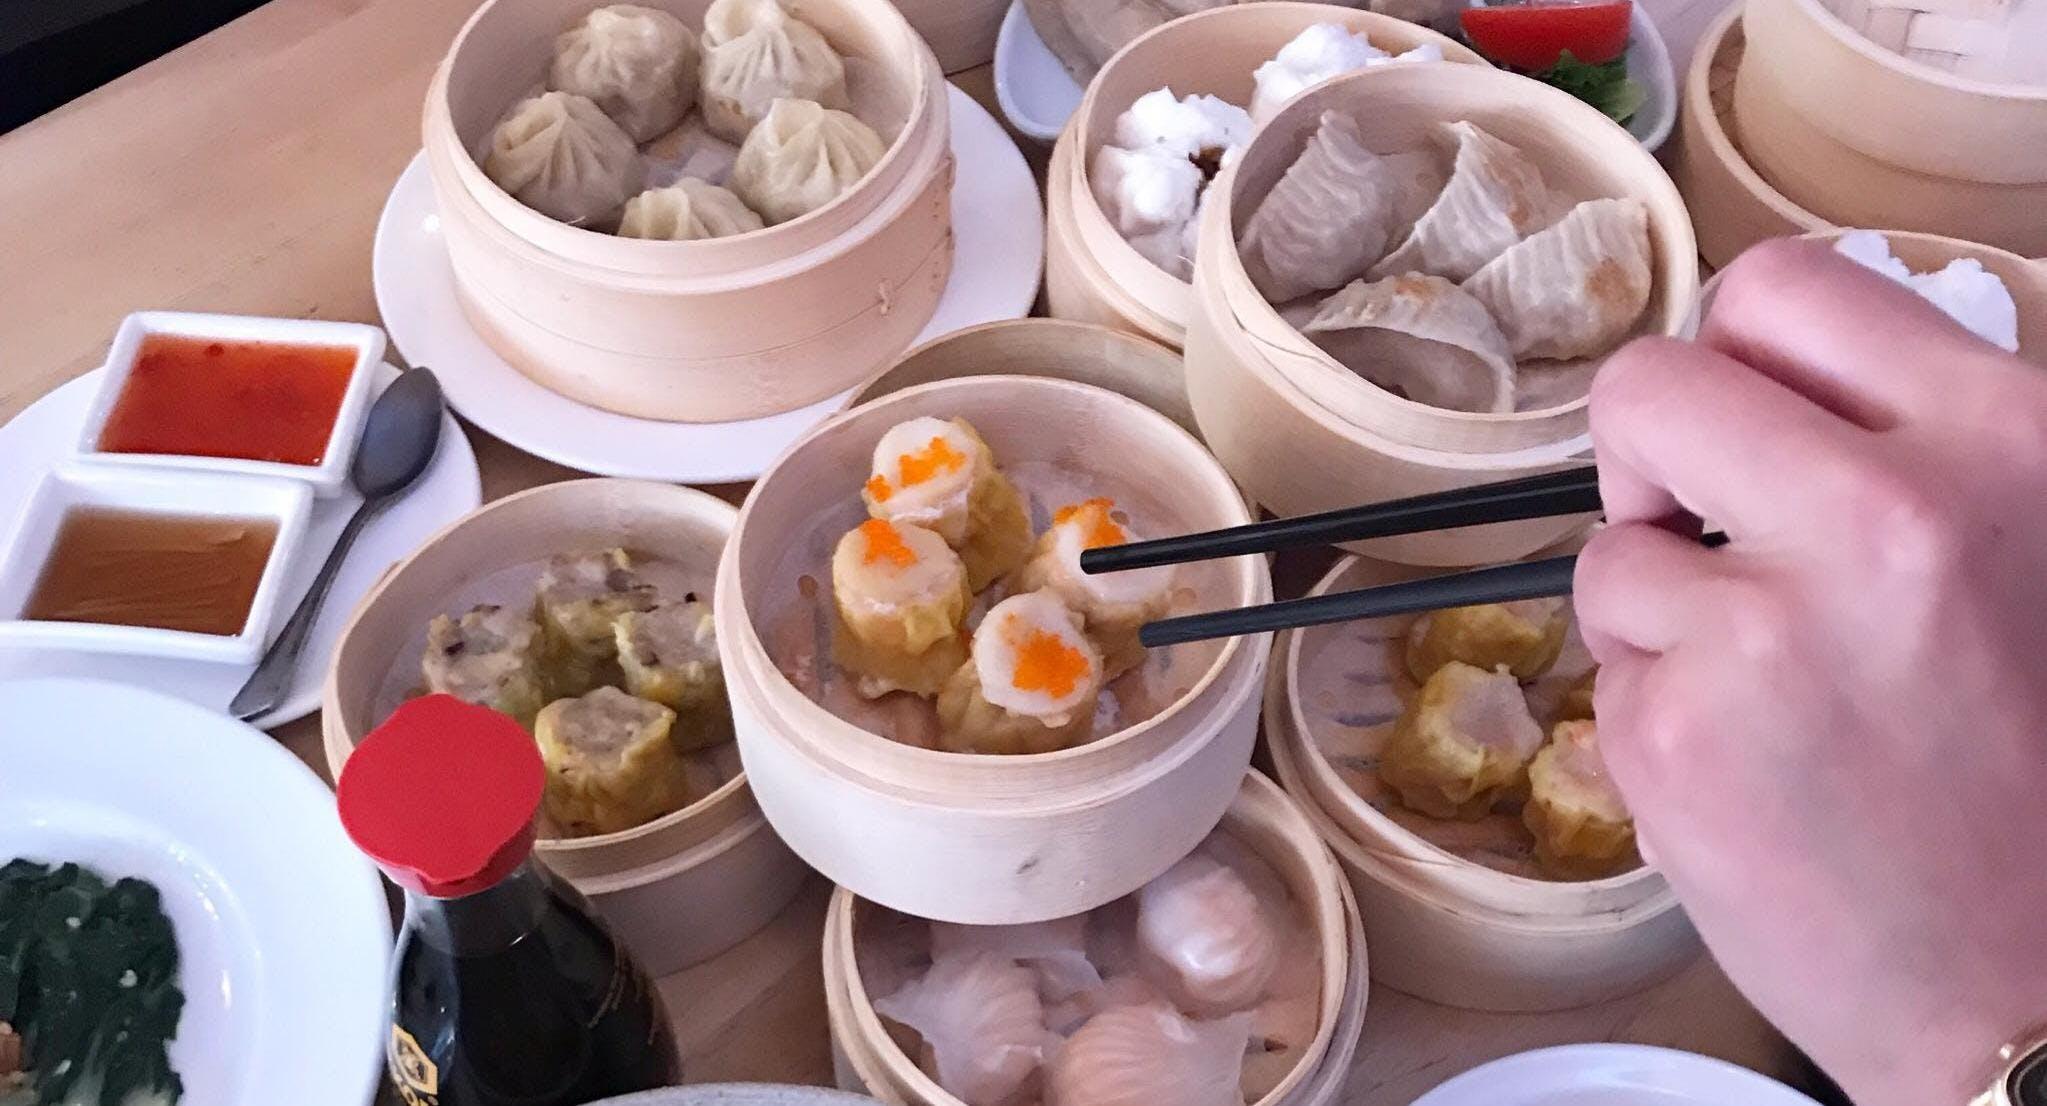 Bento Oriental Food and Japanese Cuisine